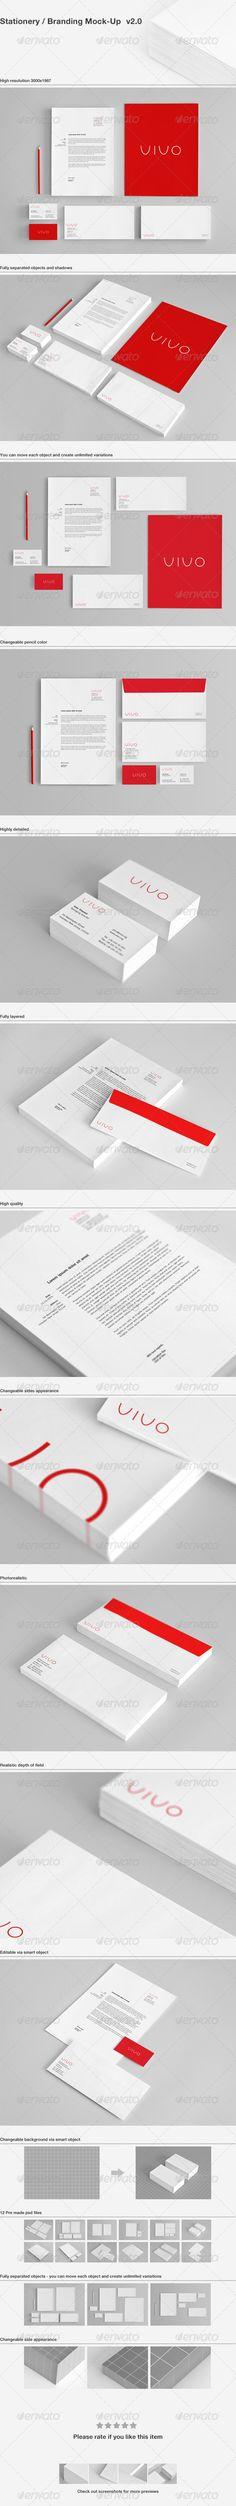 Stationery / Branding Mock-Up Download  here: https://graphicriver.net/item/stationery-branding-mockup/2017868?ref=KlitVogli